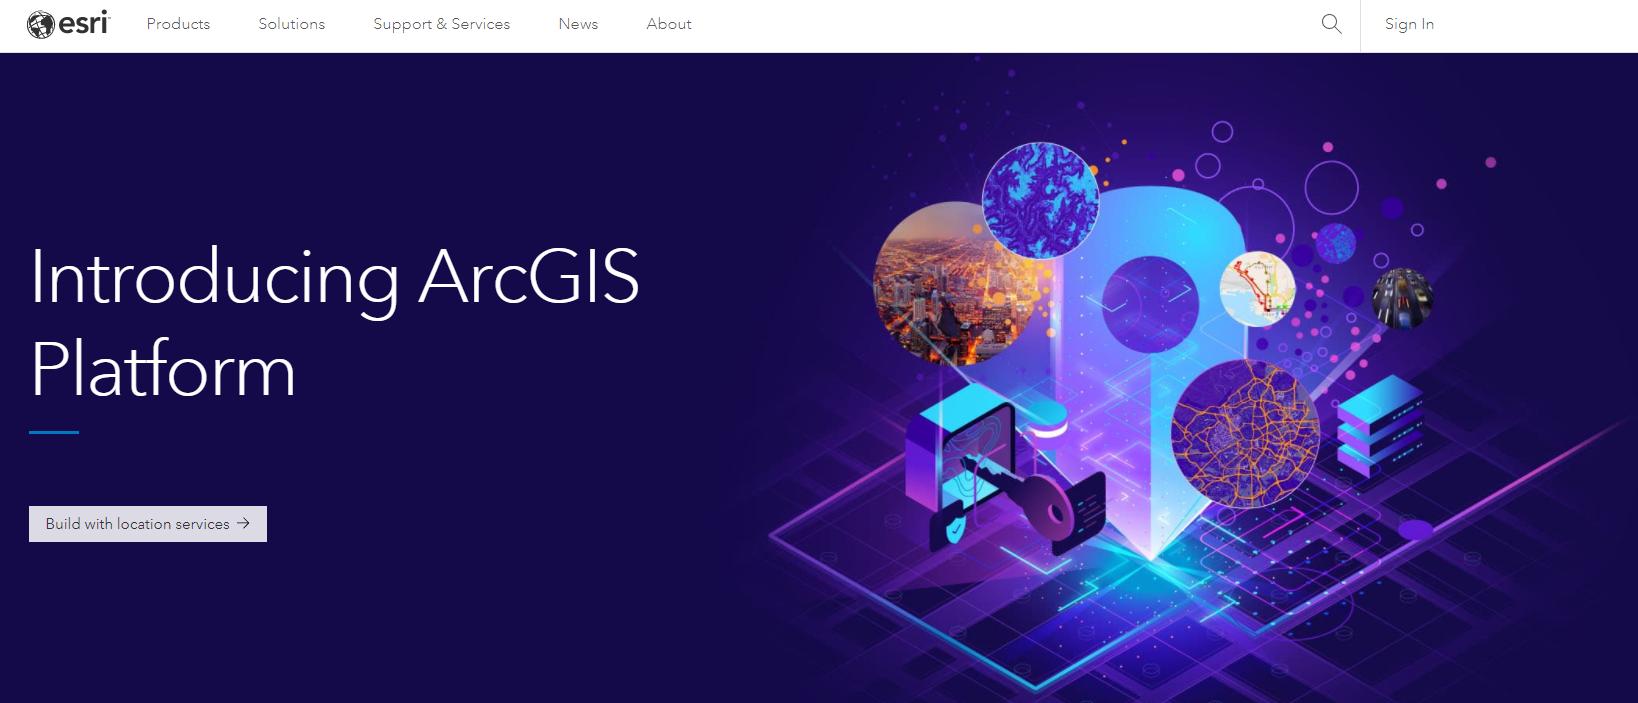 screenshot of the Esri website